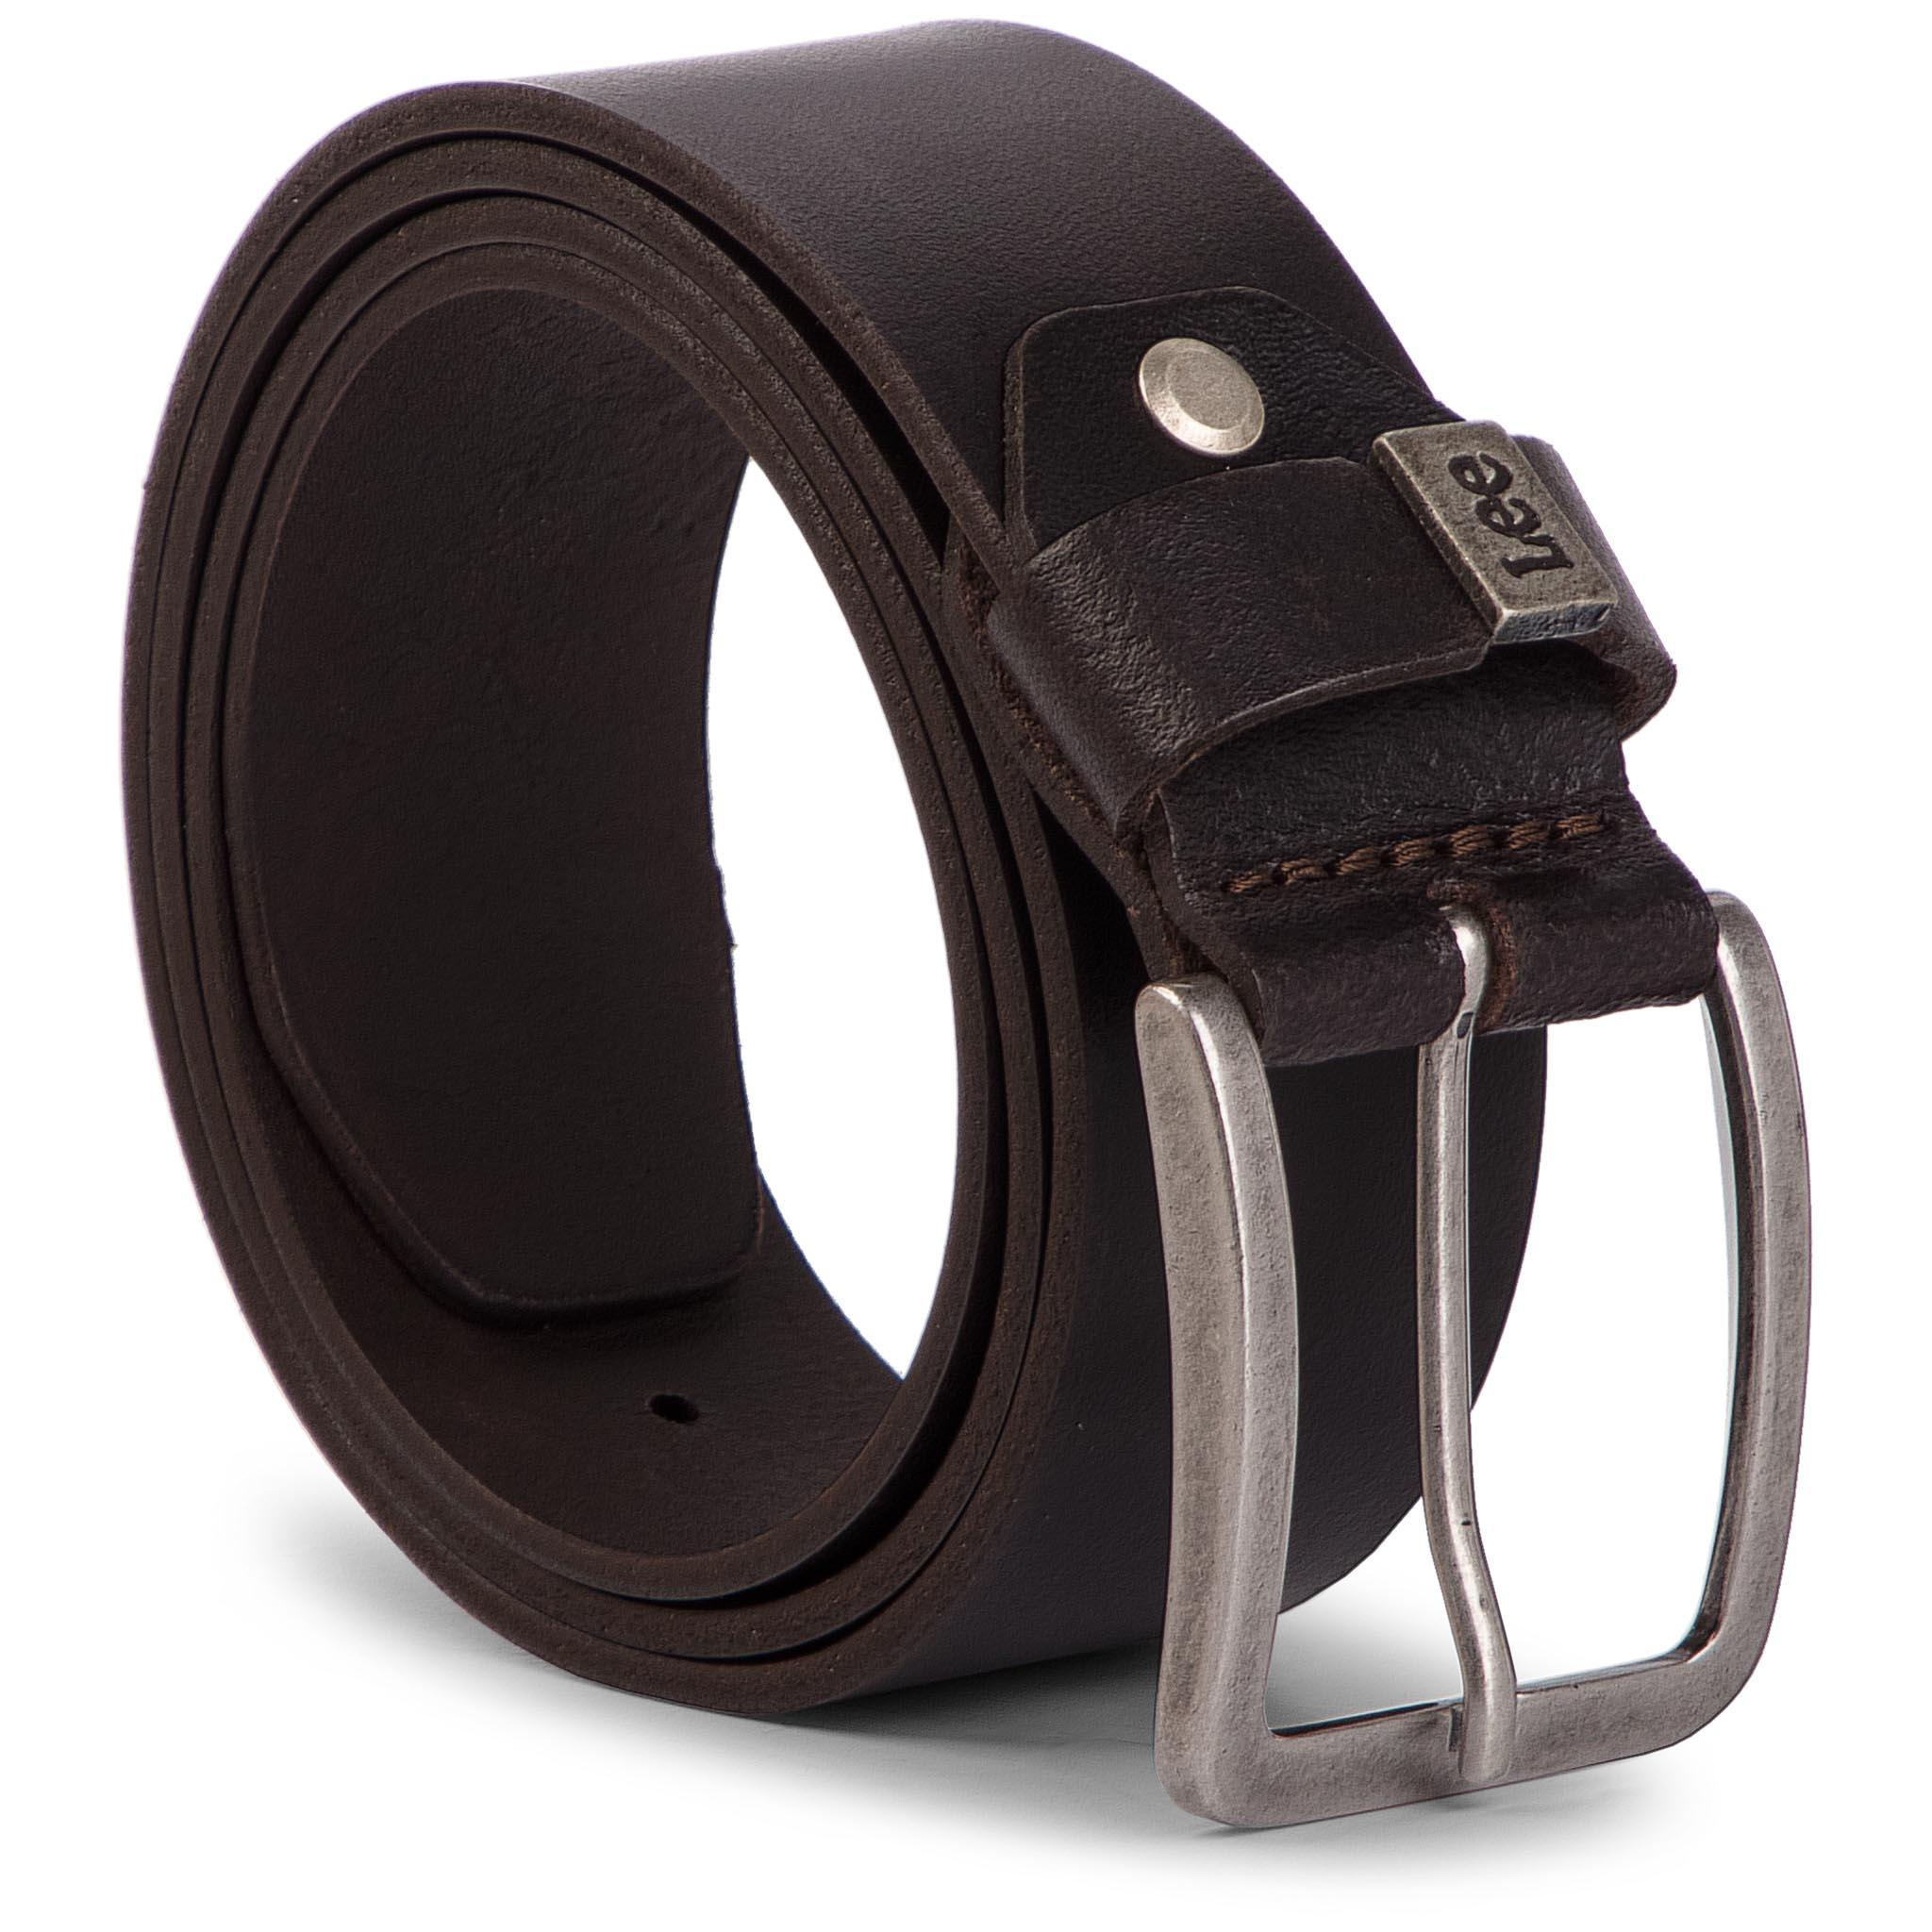 Image of Cintura da uomo LEE - Small Logo Belt LA035324 85 Dark Brown